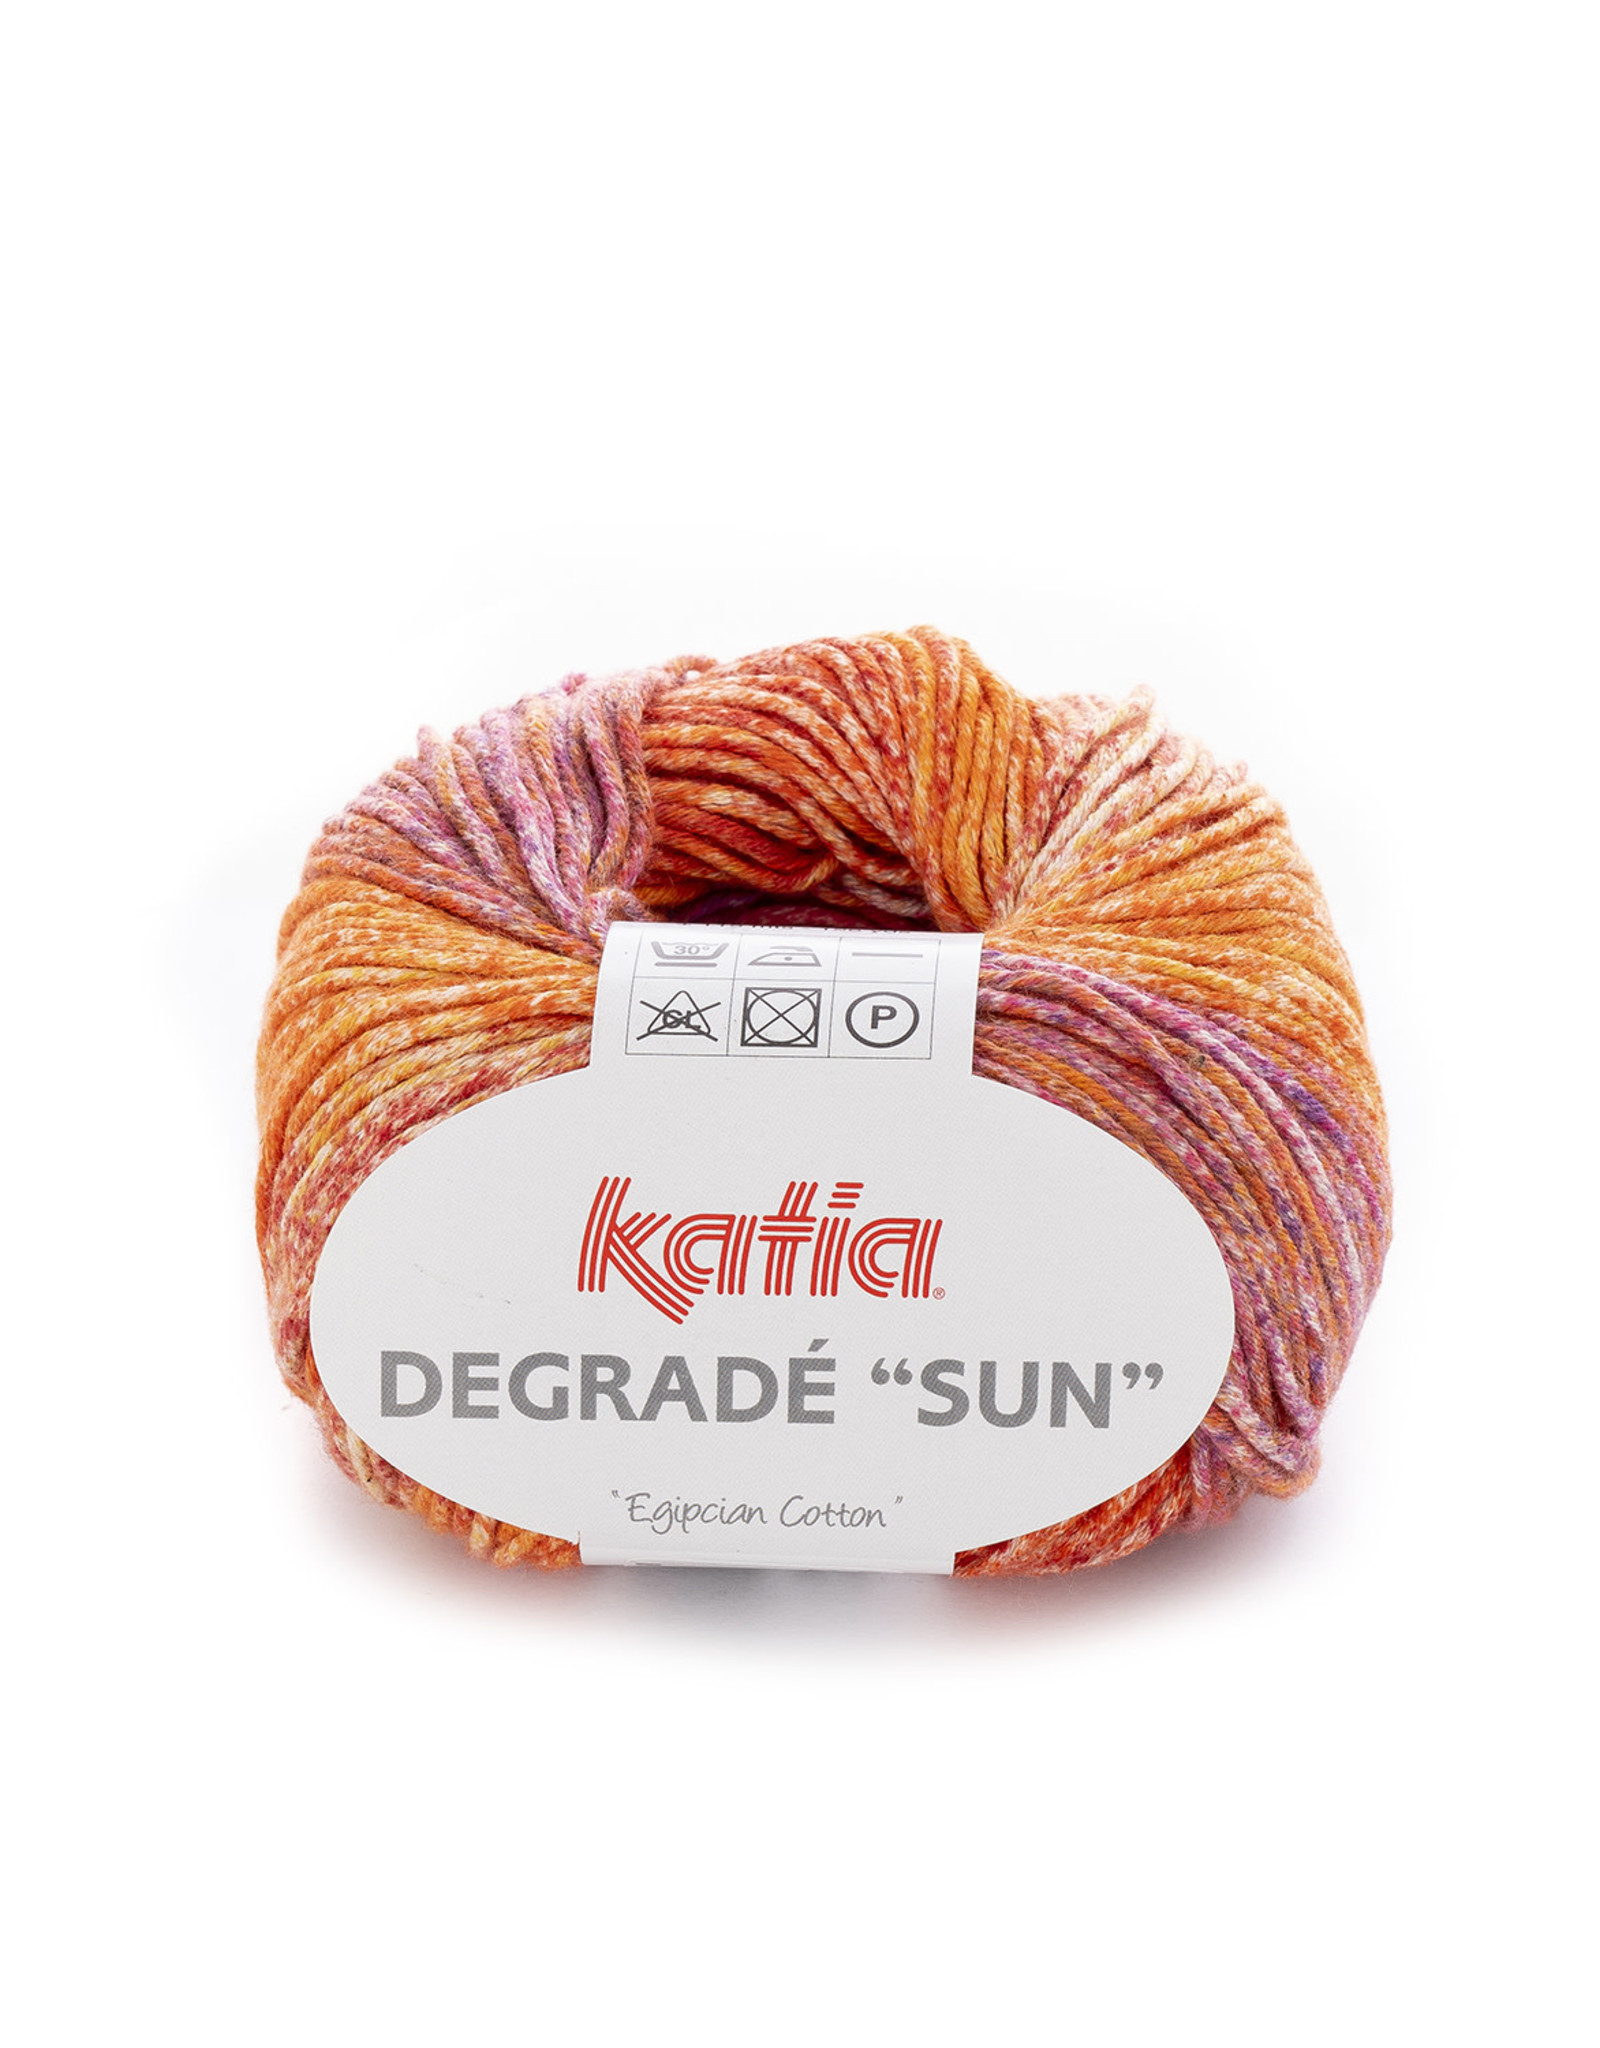 Katia Katia Degrade Sun 203 roodoranje-geel-roodroze